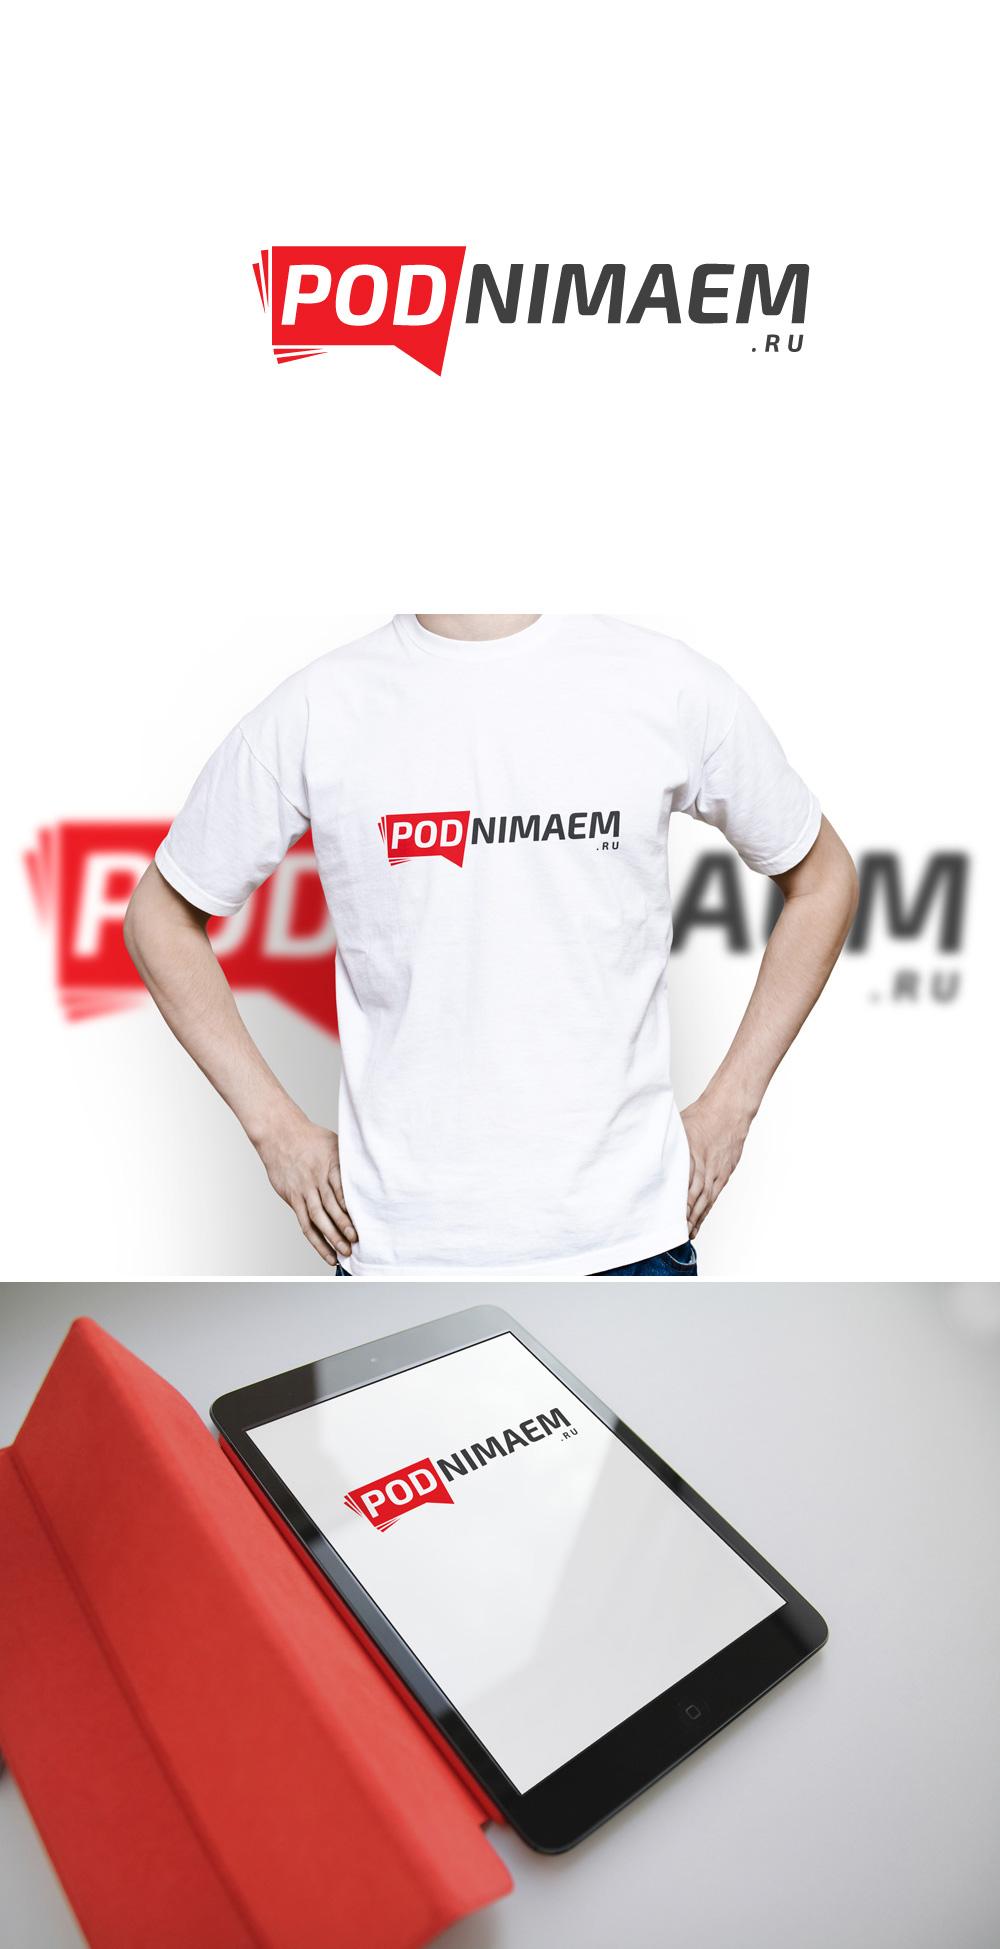 Разработать логотип + визитку + логотип для печати ООО +++ фото f_54355475ea6bd86c.jpg